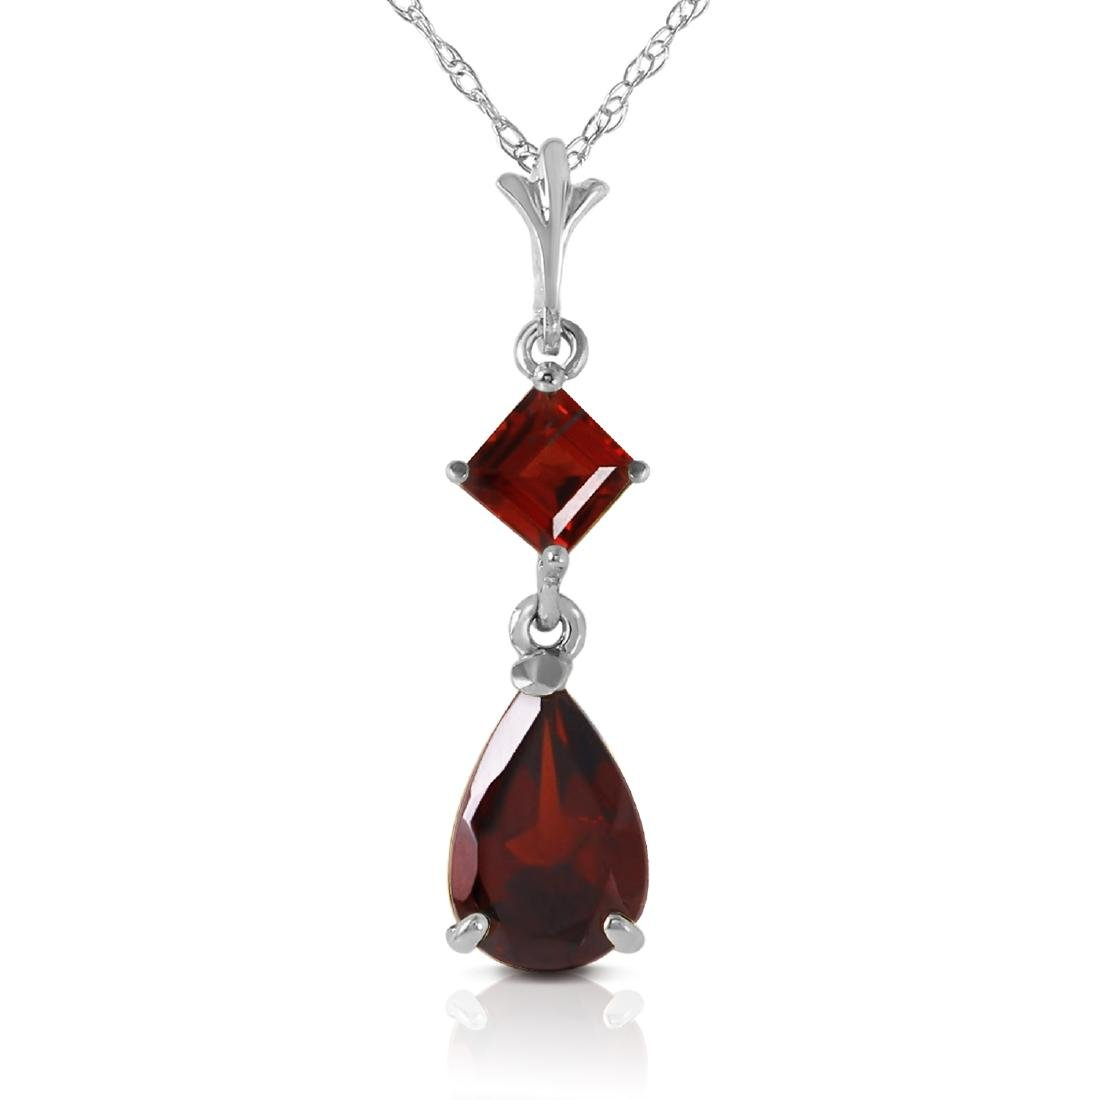 Genuine 2 ctw Garnet Necklace Jewelry 14KT White Gold -